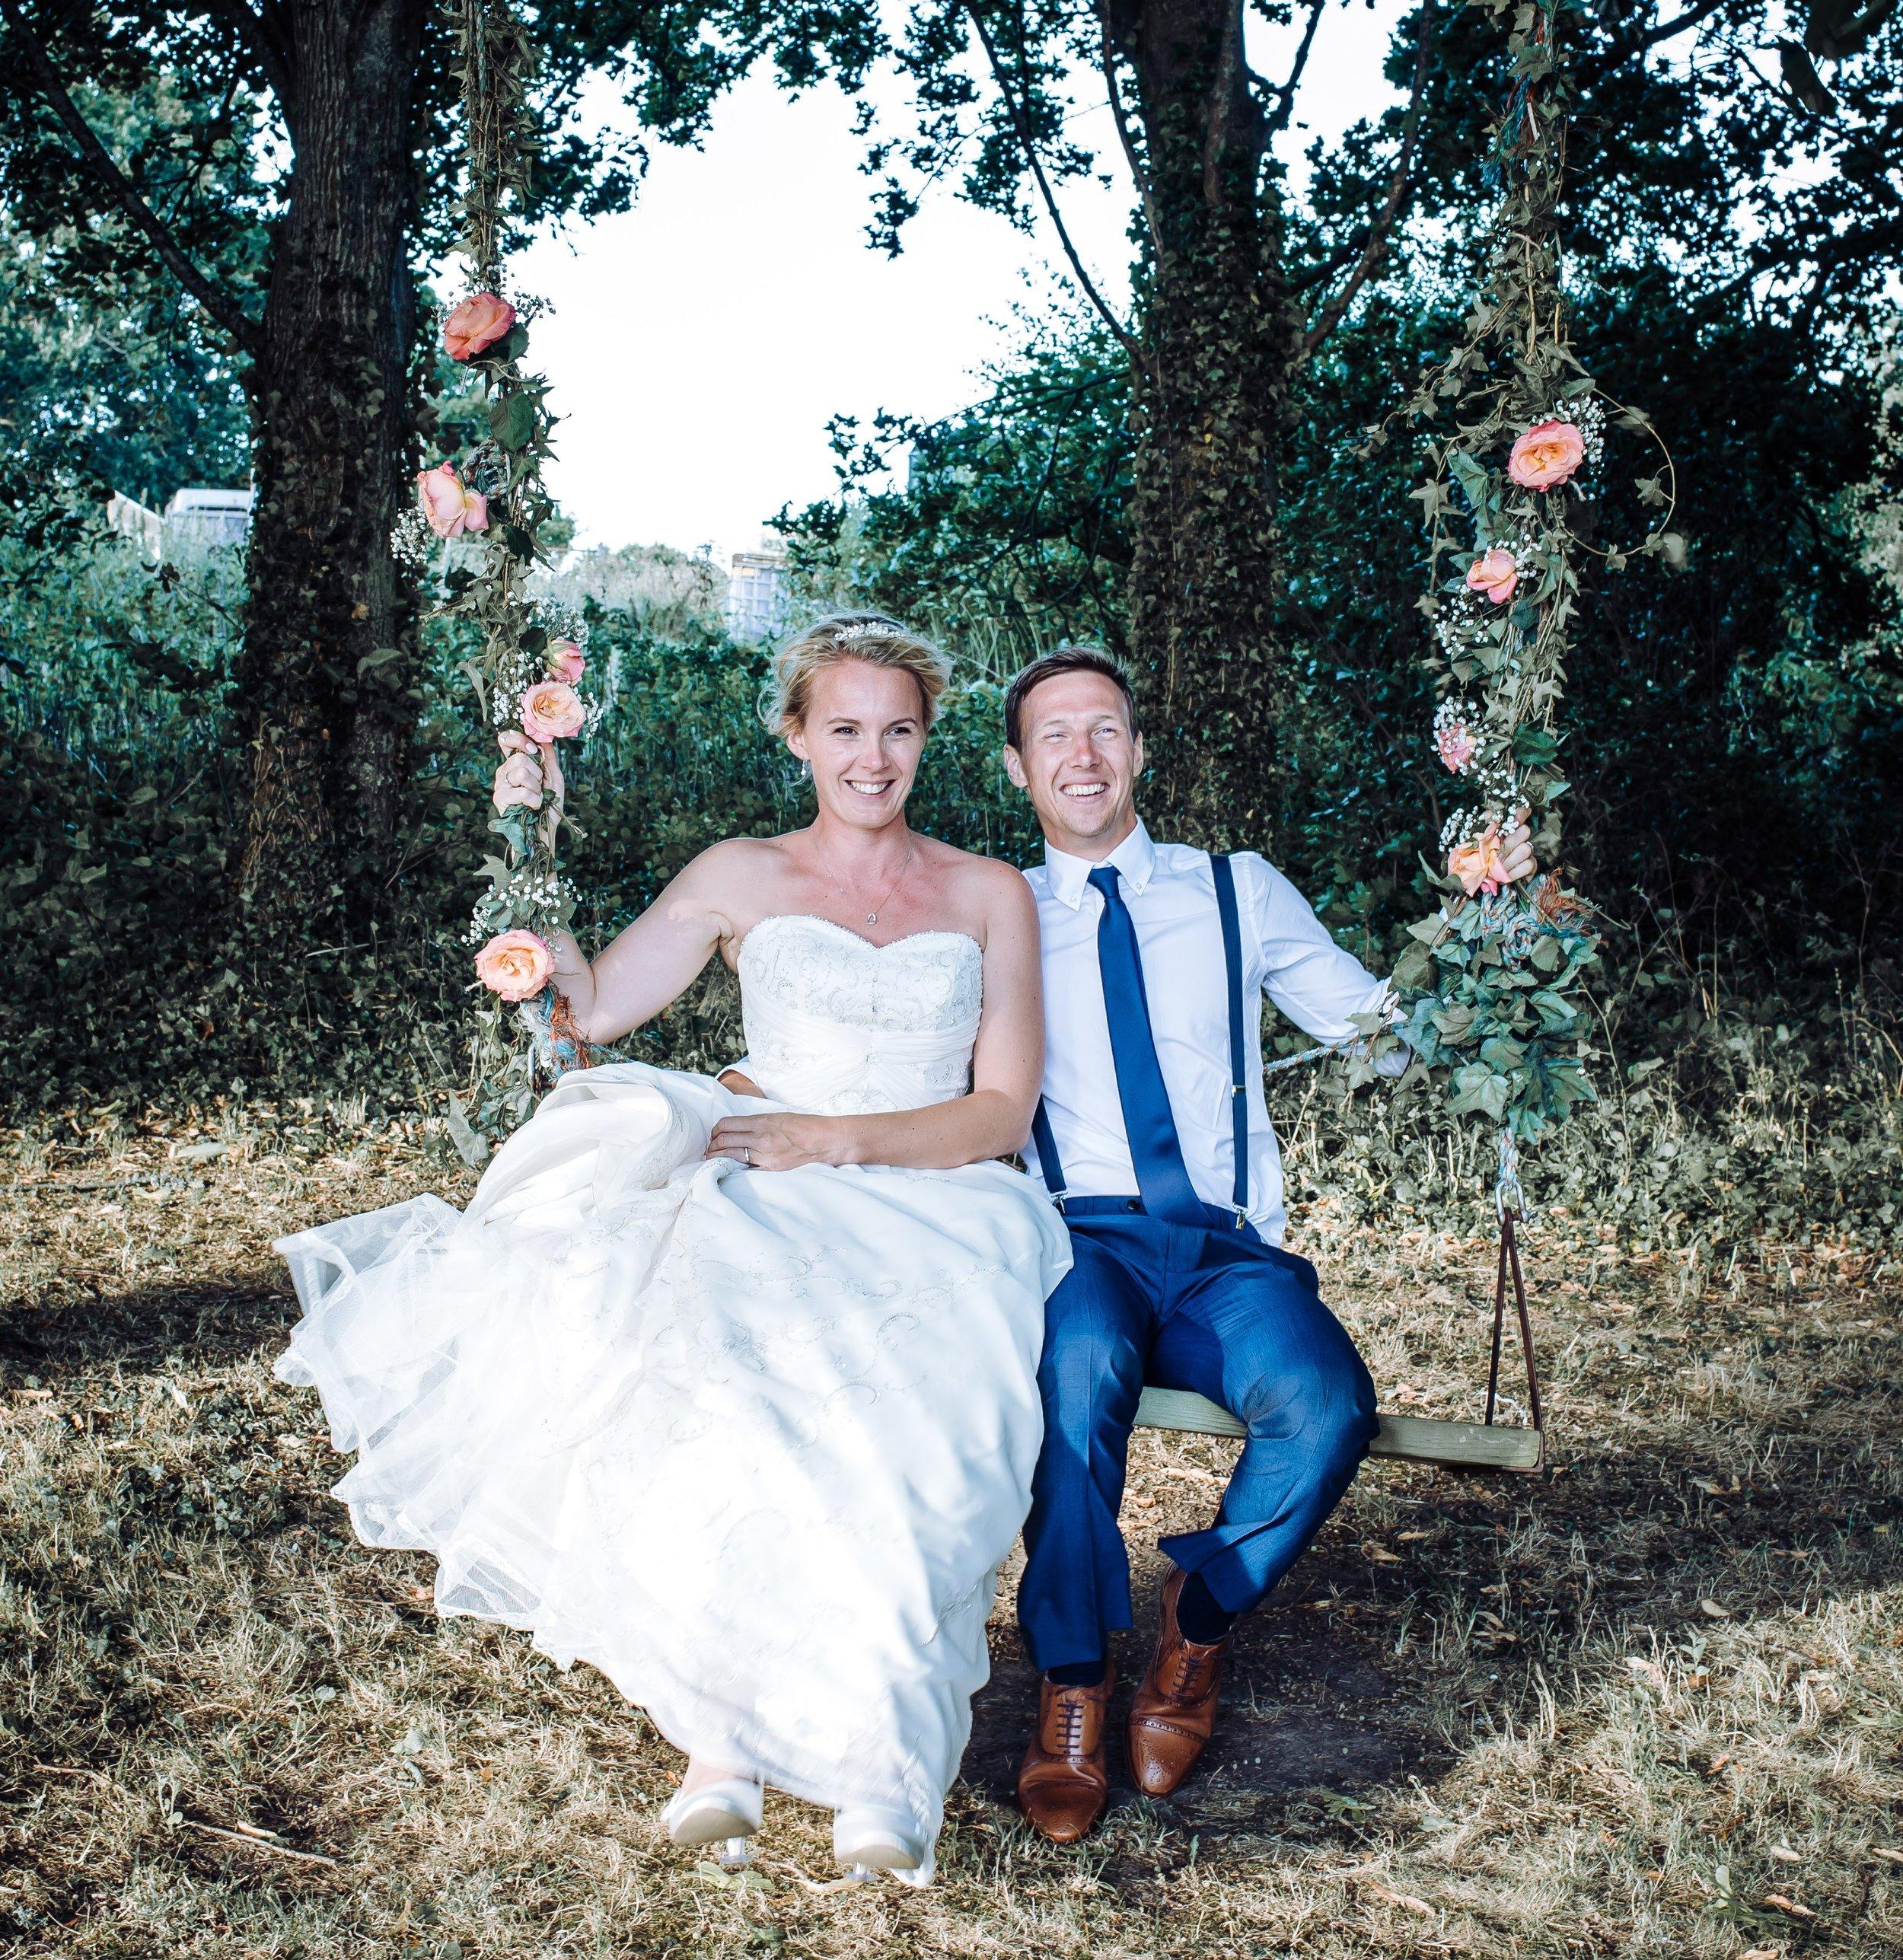 Vintage Wedding - East Sussex Wedding Photographer_0042.jpg